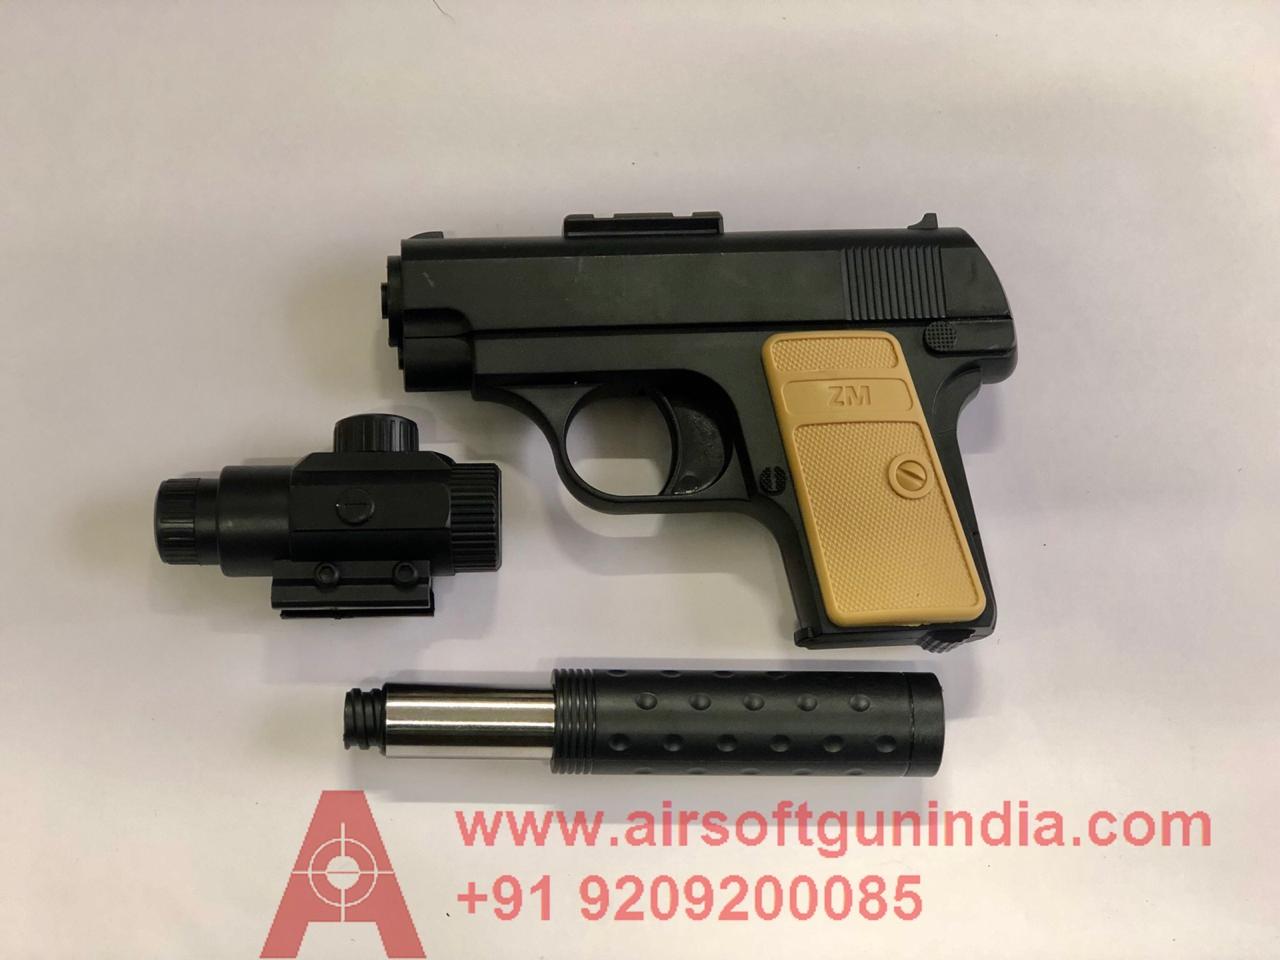 ZM Mini Airsoft Pistol By Airsoft Gun India